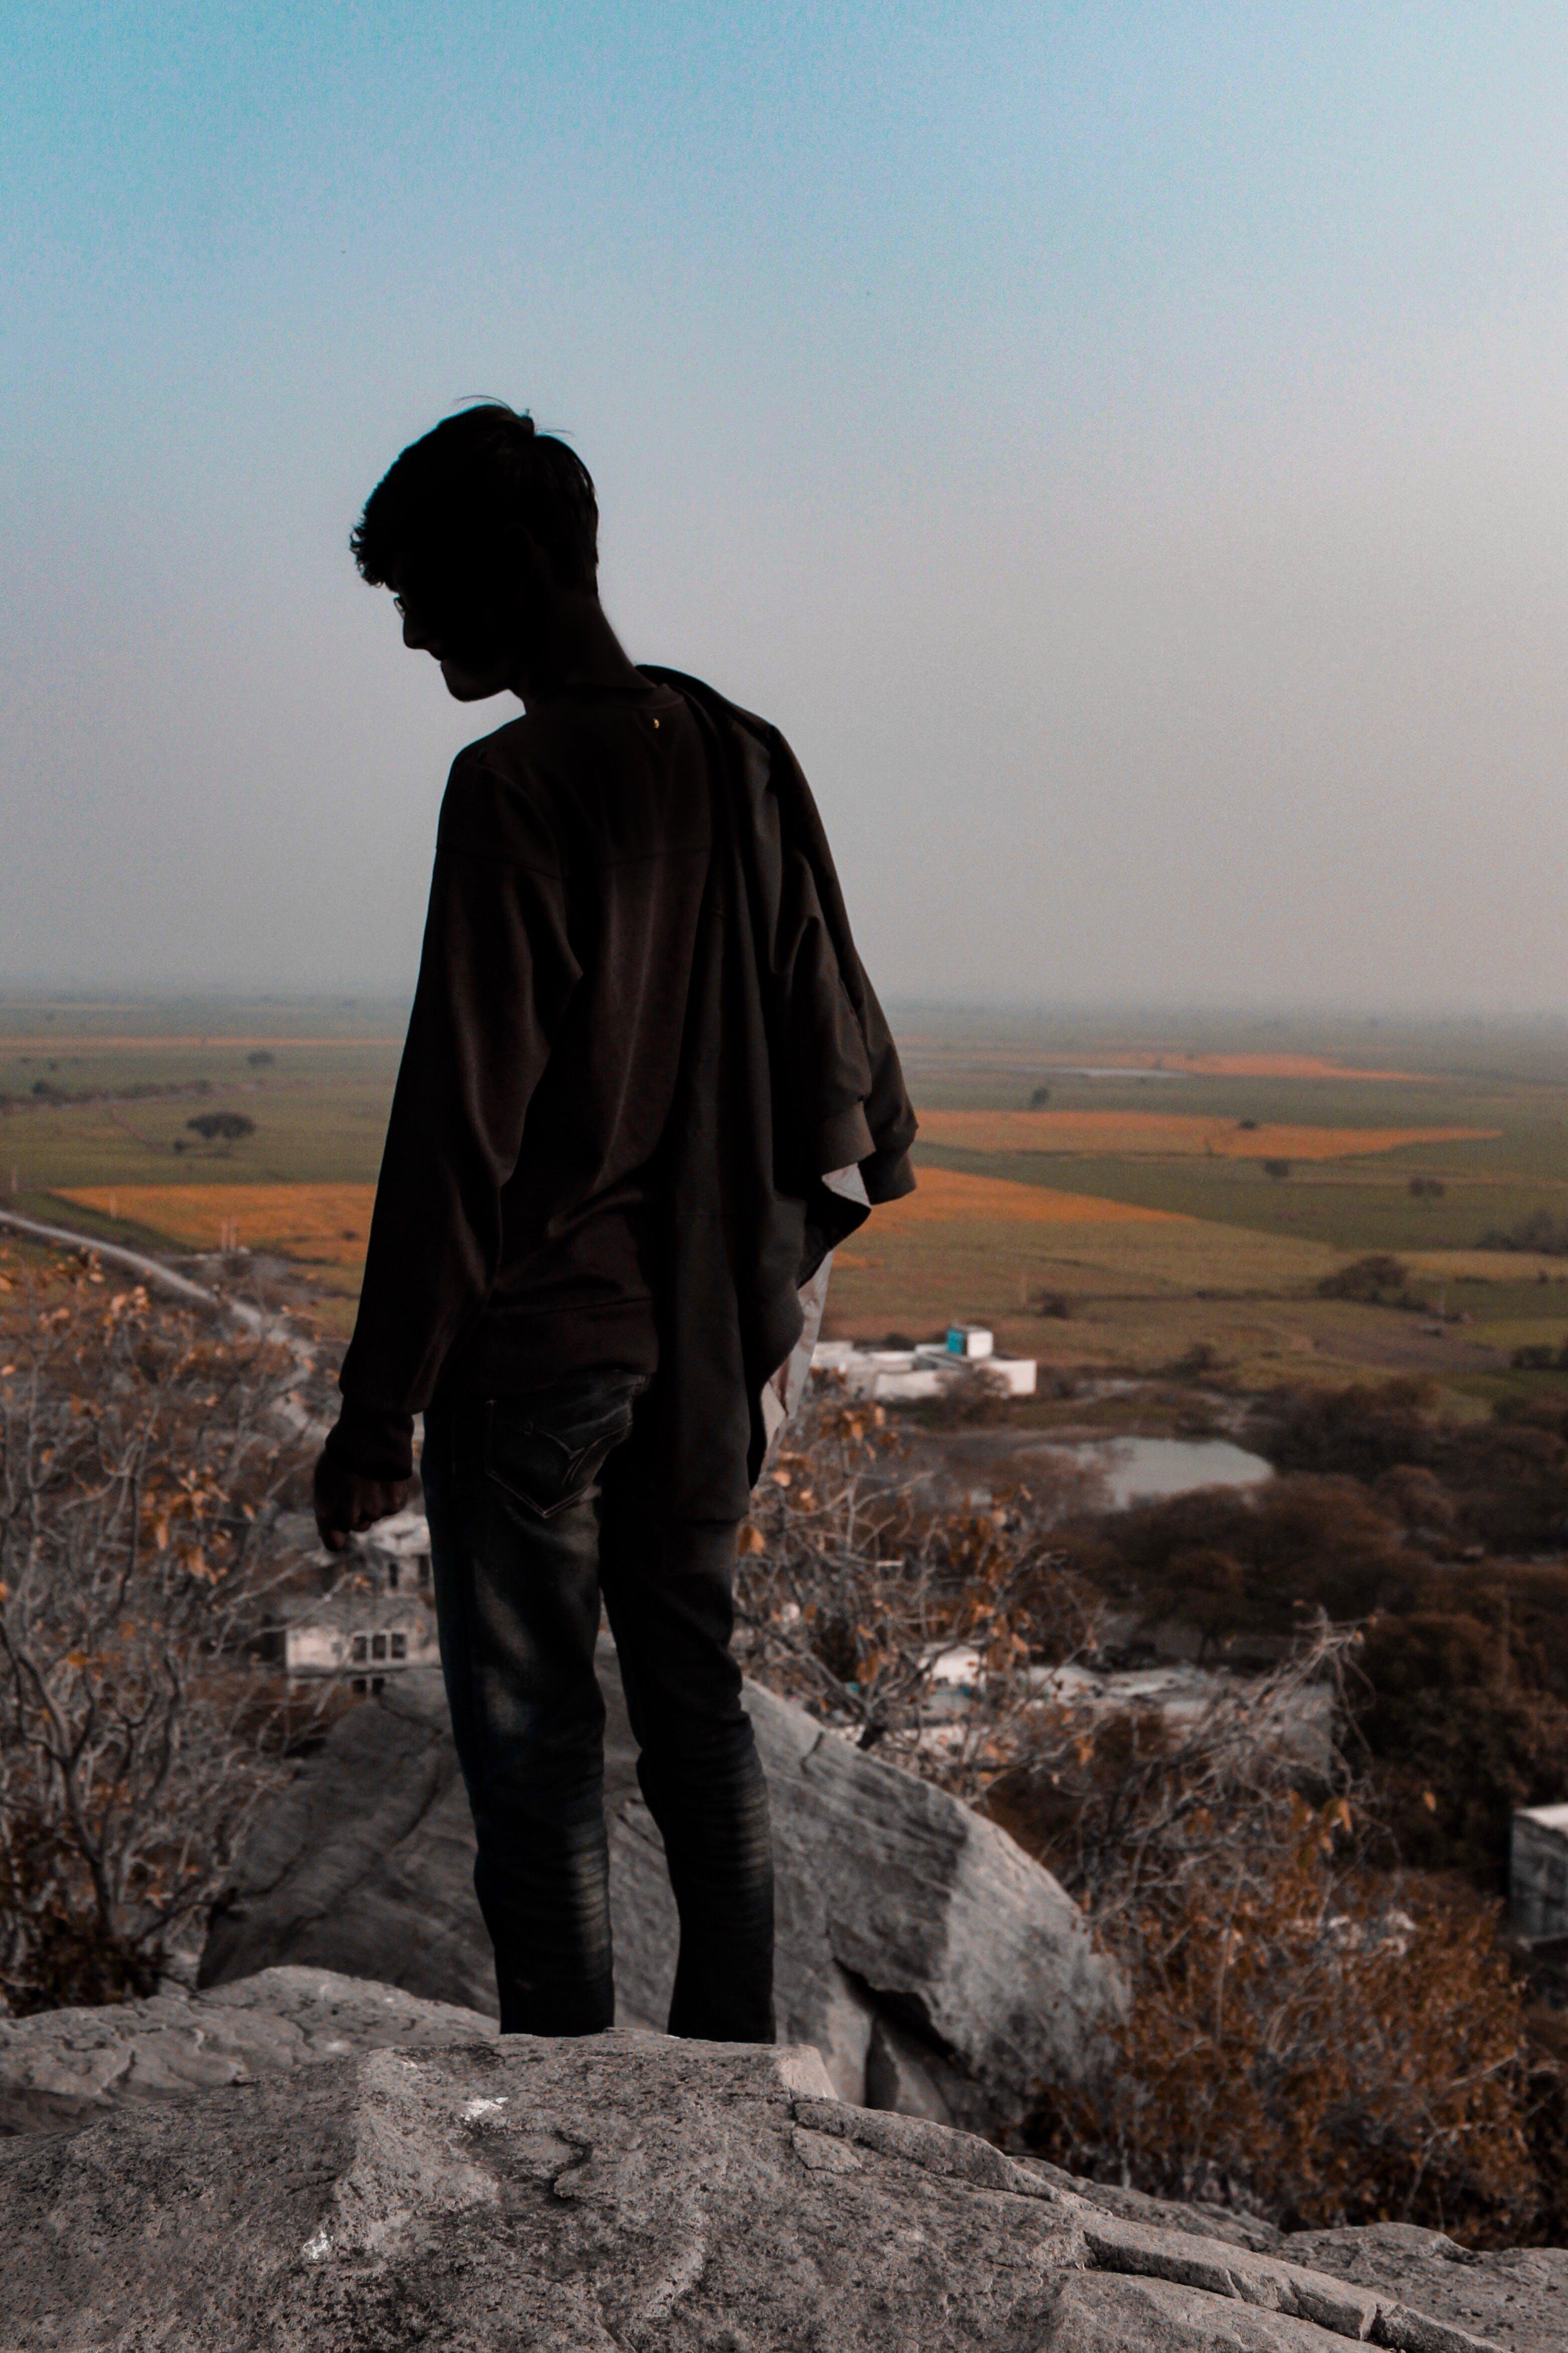 Free stock photo of boy, standing